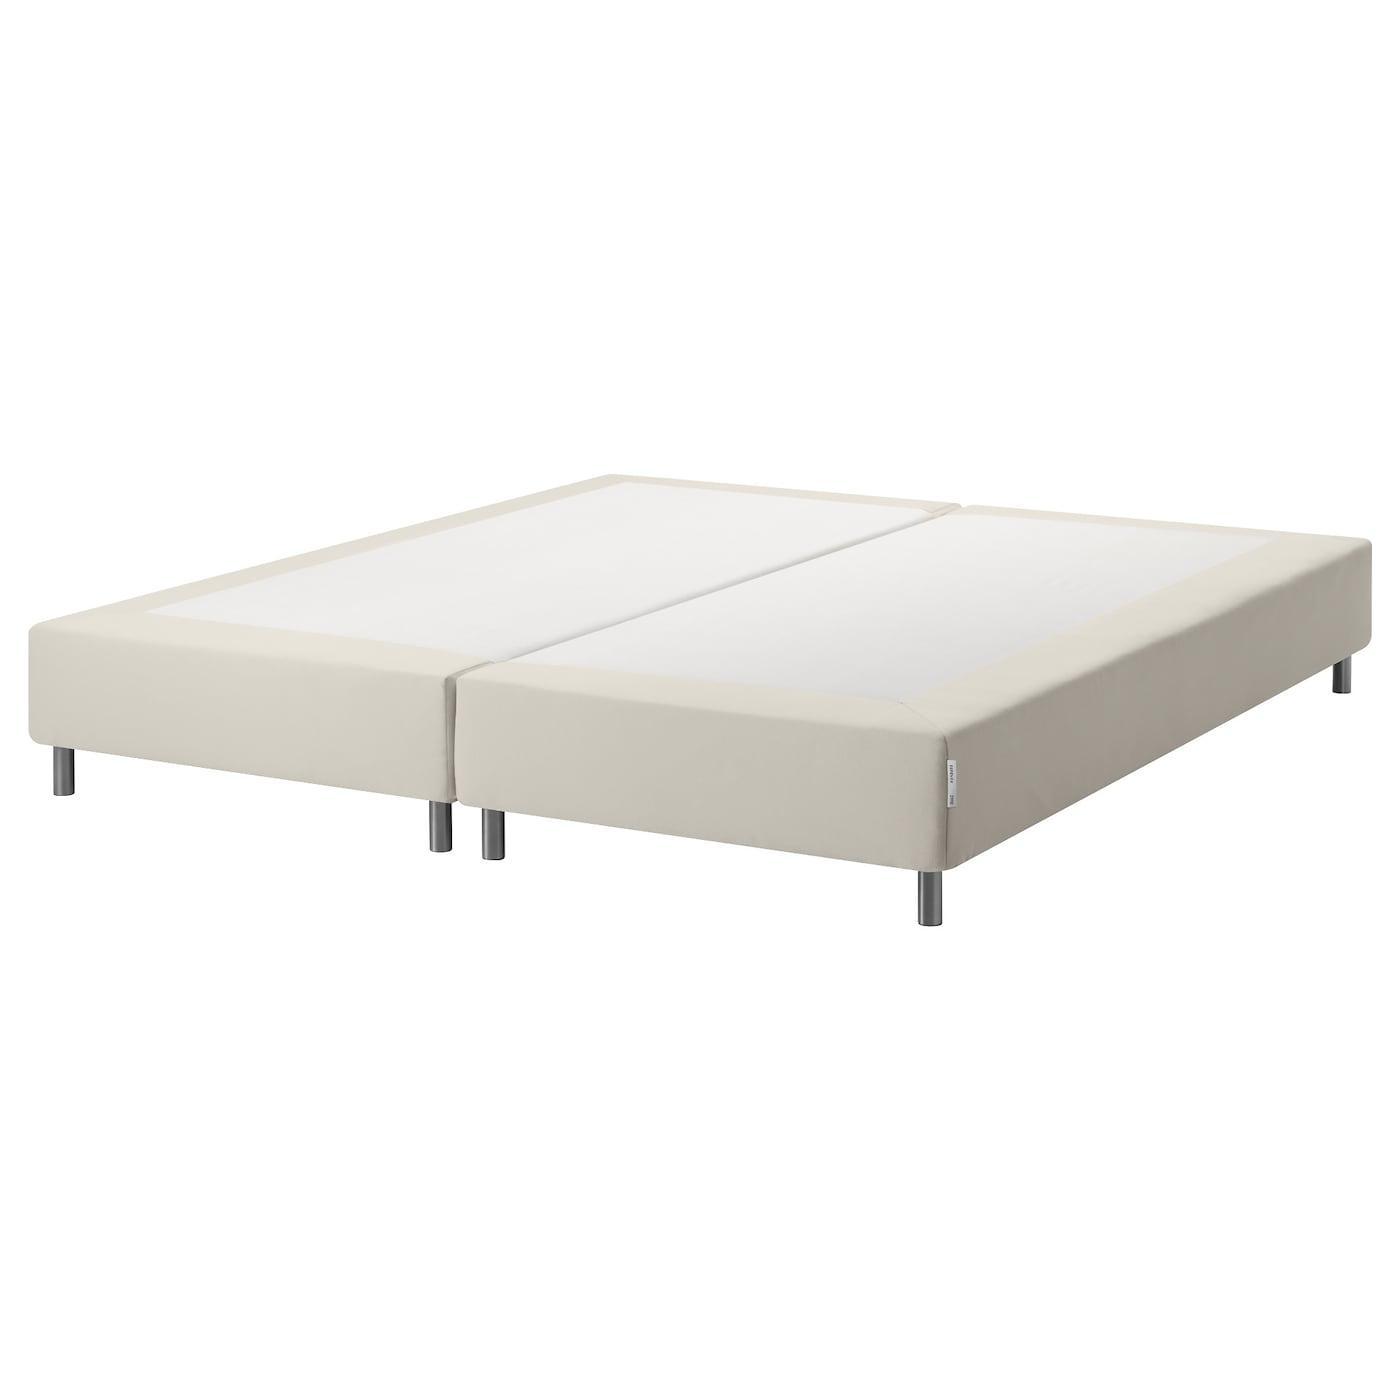 espev r sommier ressorts avec pieds beige 180x200 cm ikea. Black Bedroom Furniture Sets. Home Design Ideas